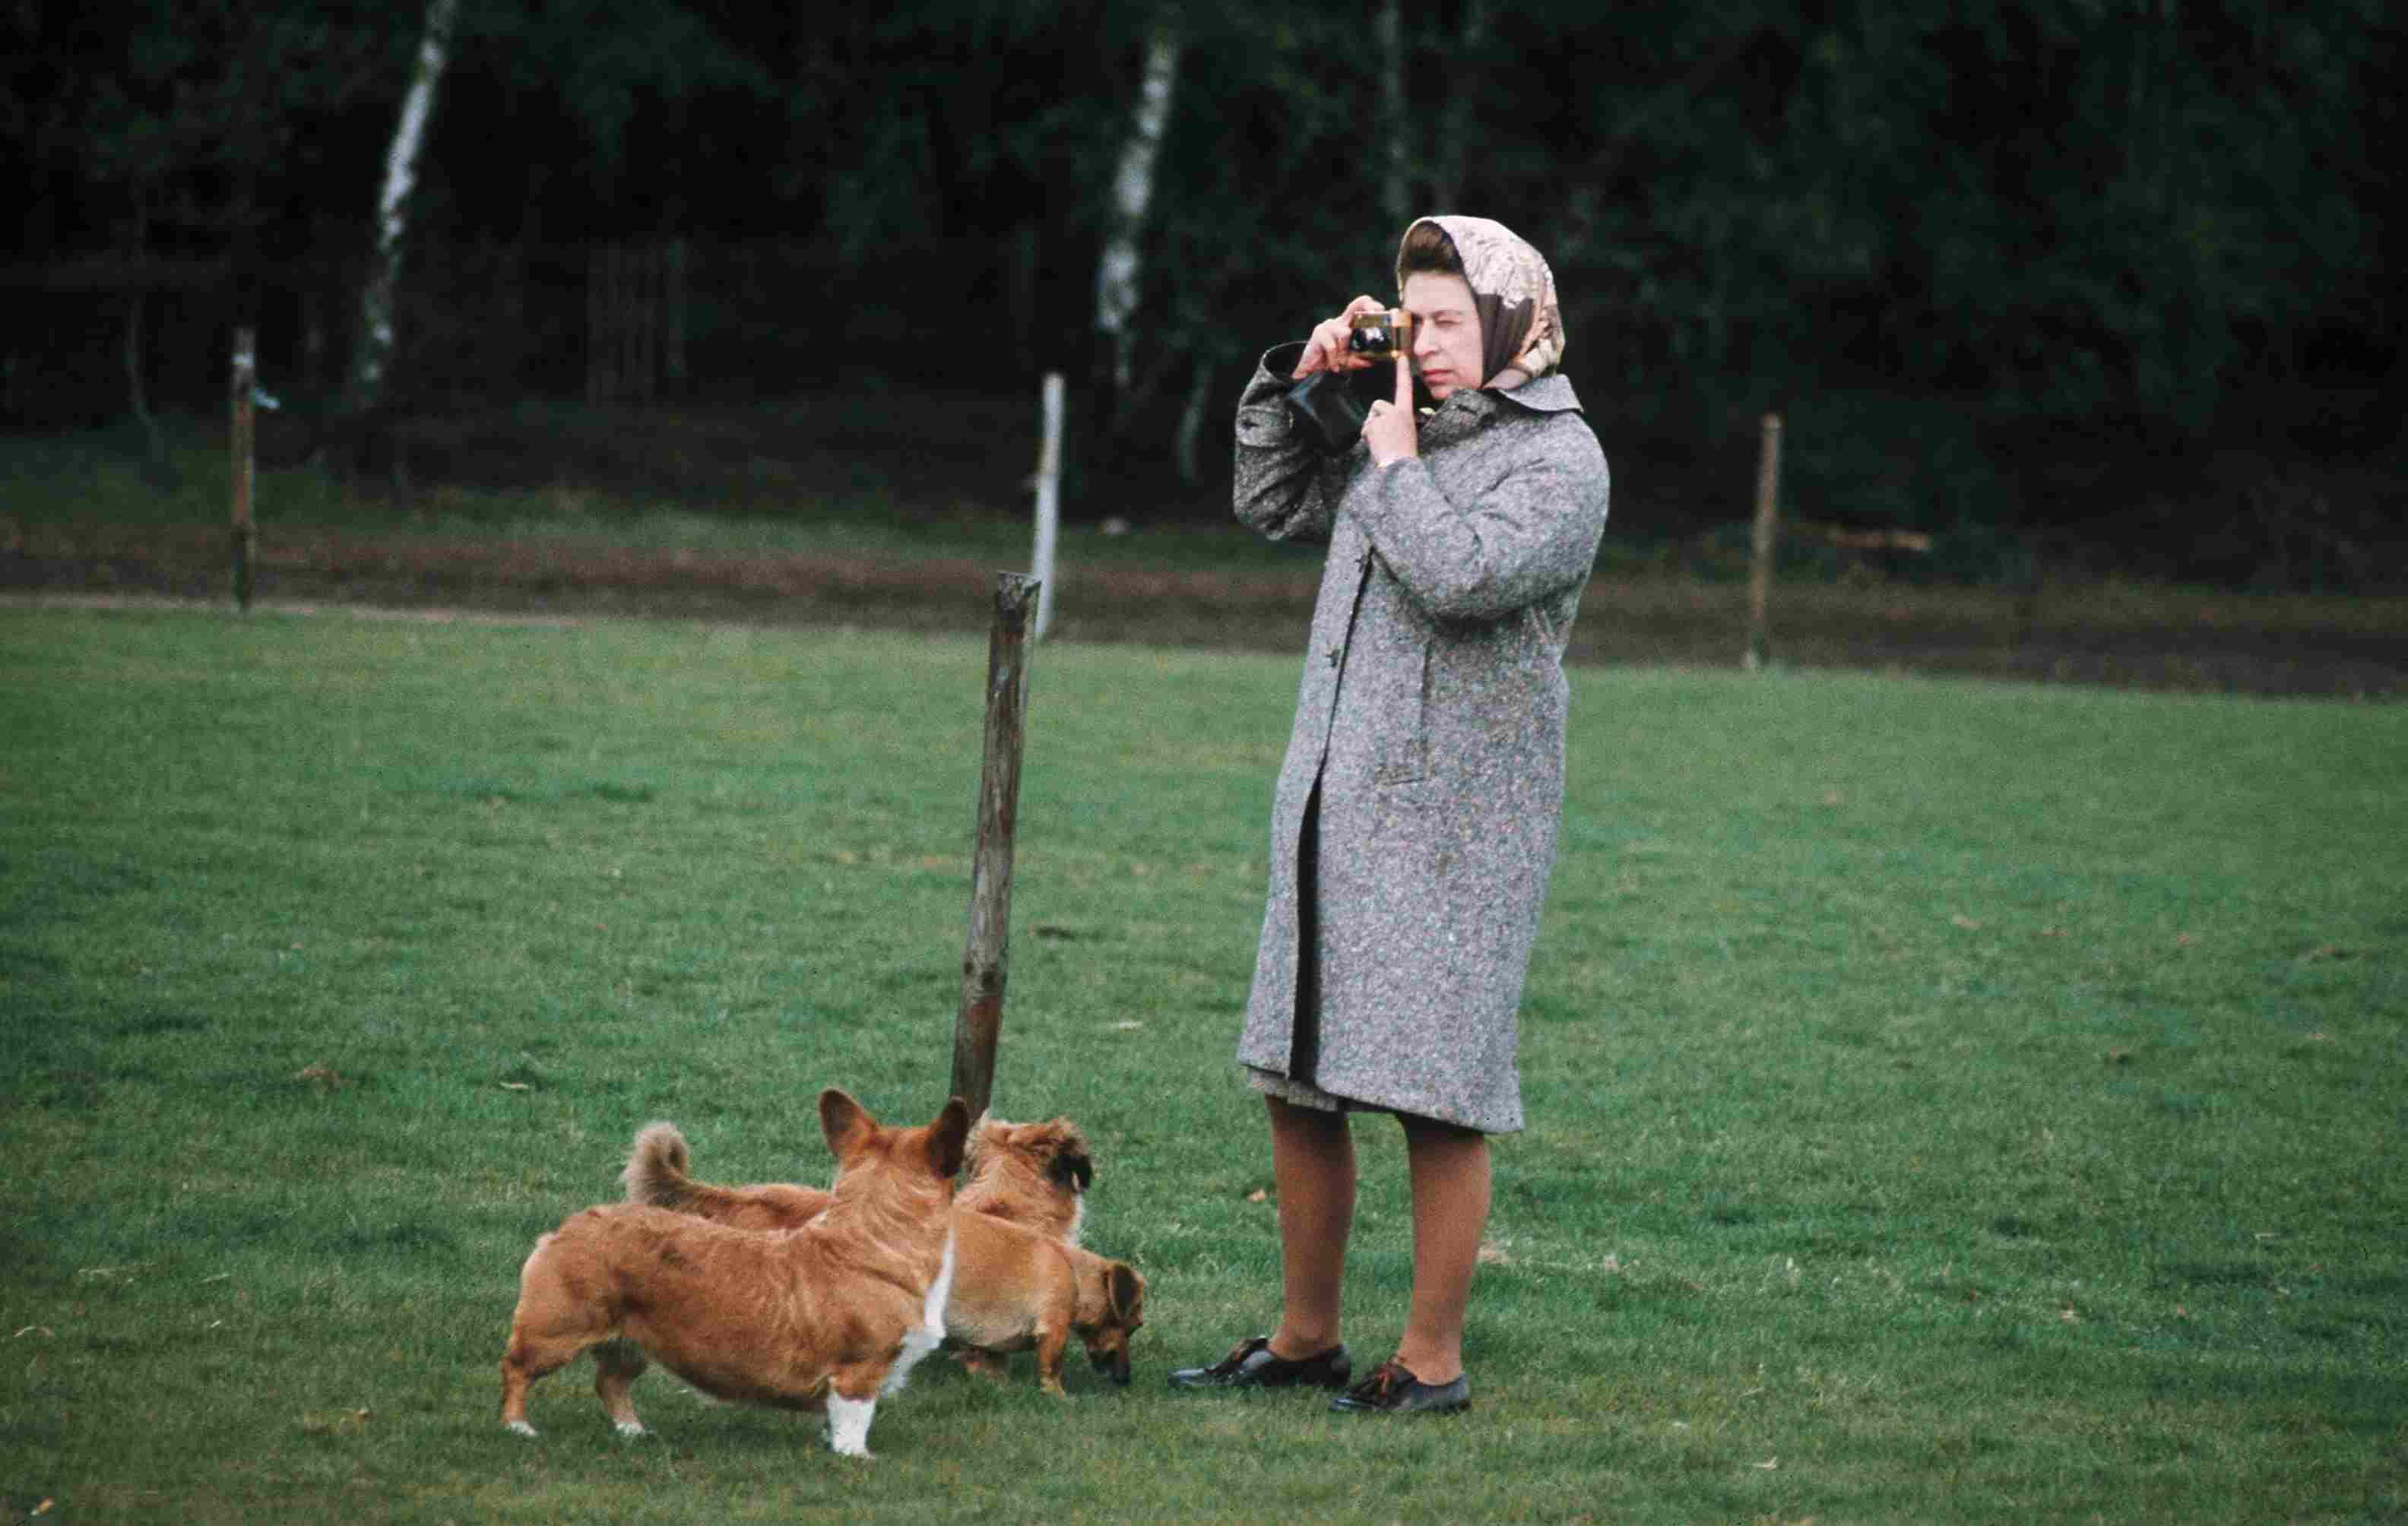 La reina Isabel II en Windsor Park fotografiando sus corgis en 1960, en Inglaterra.